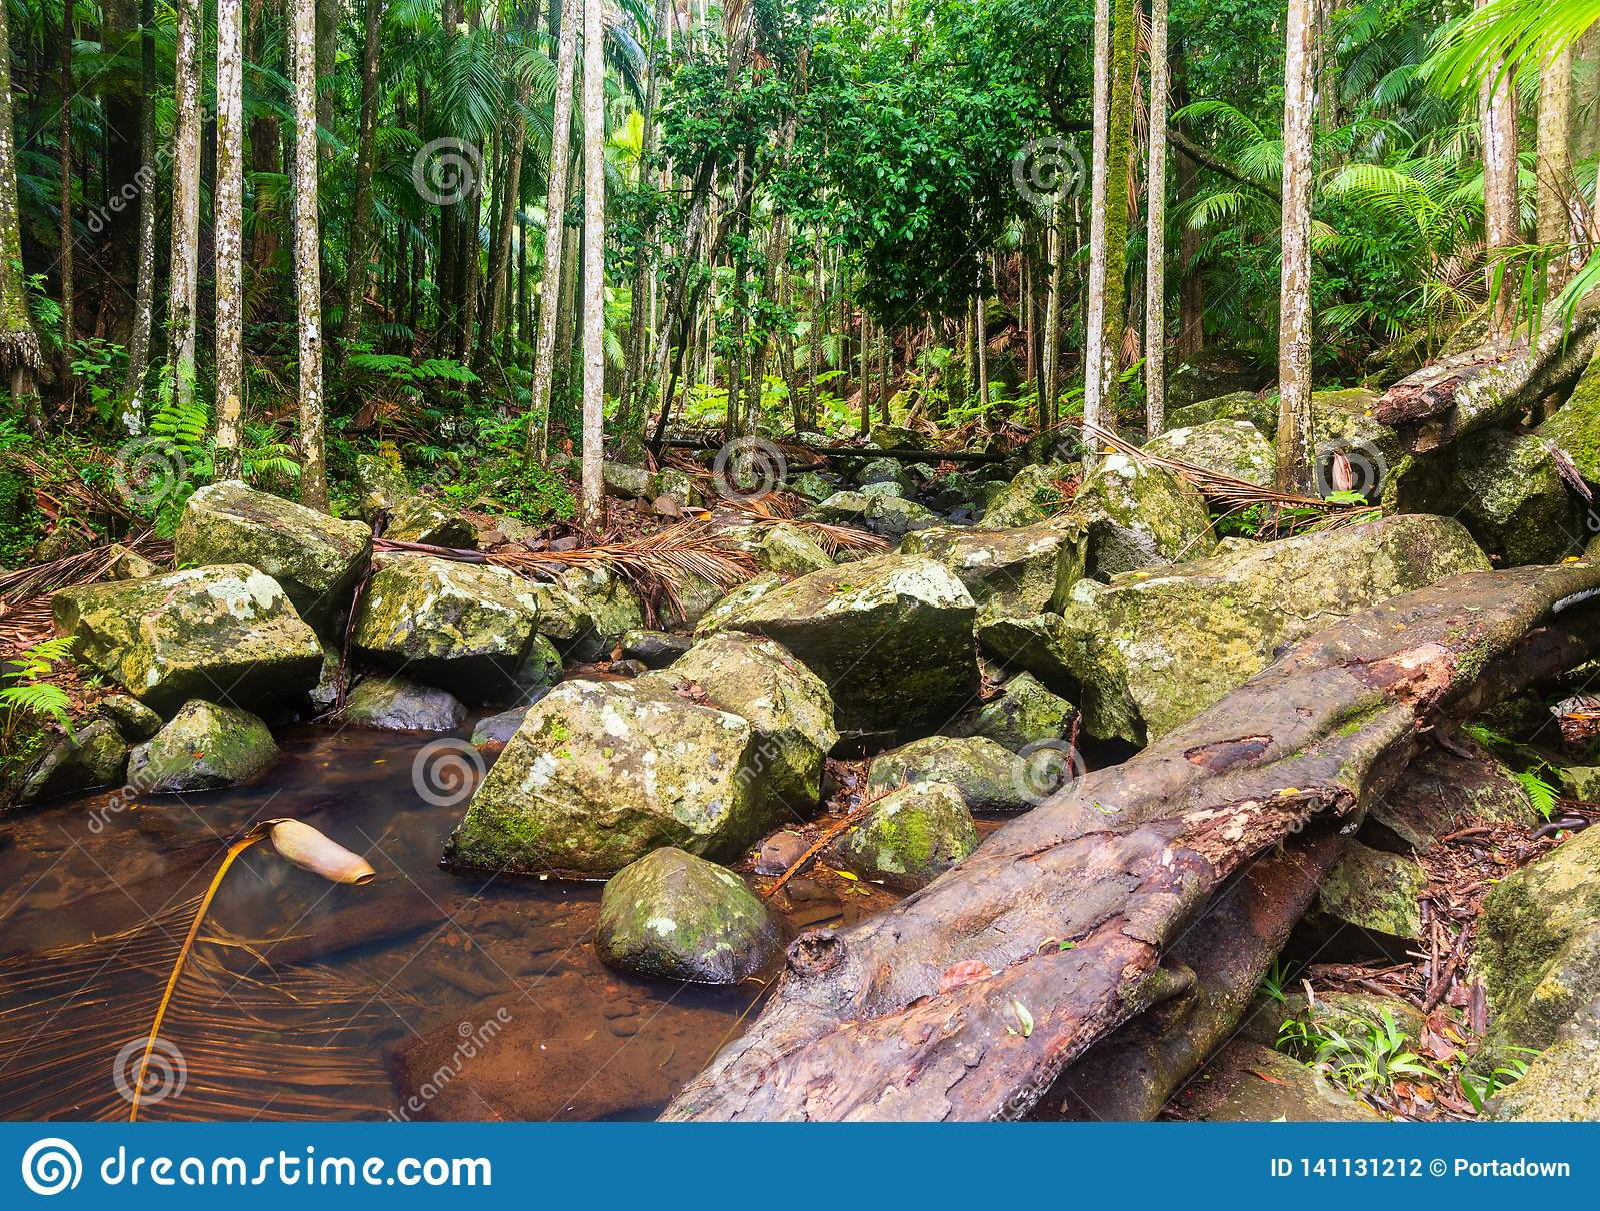 Creek in a Subtropical Rainforest - Australia